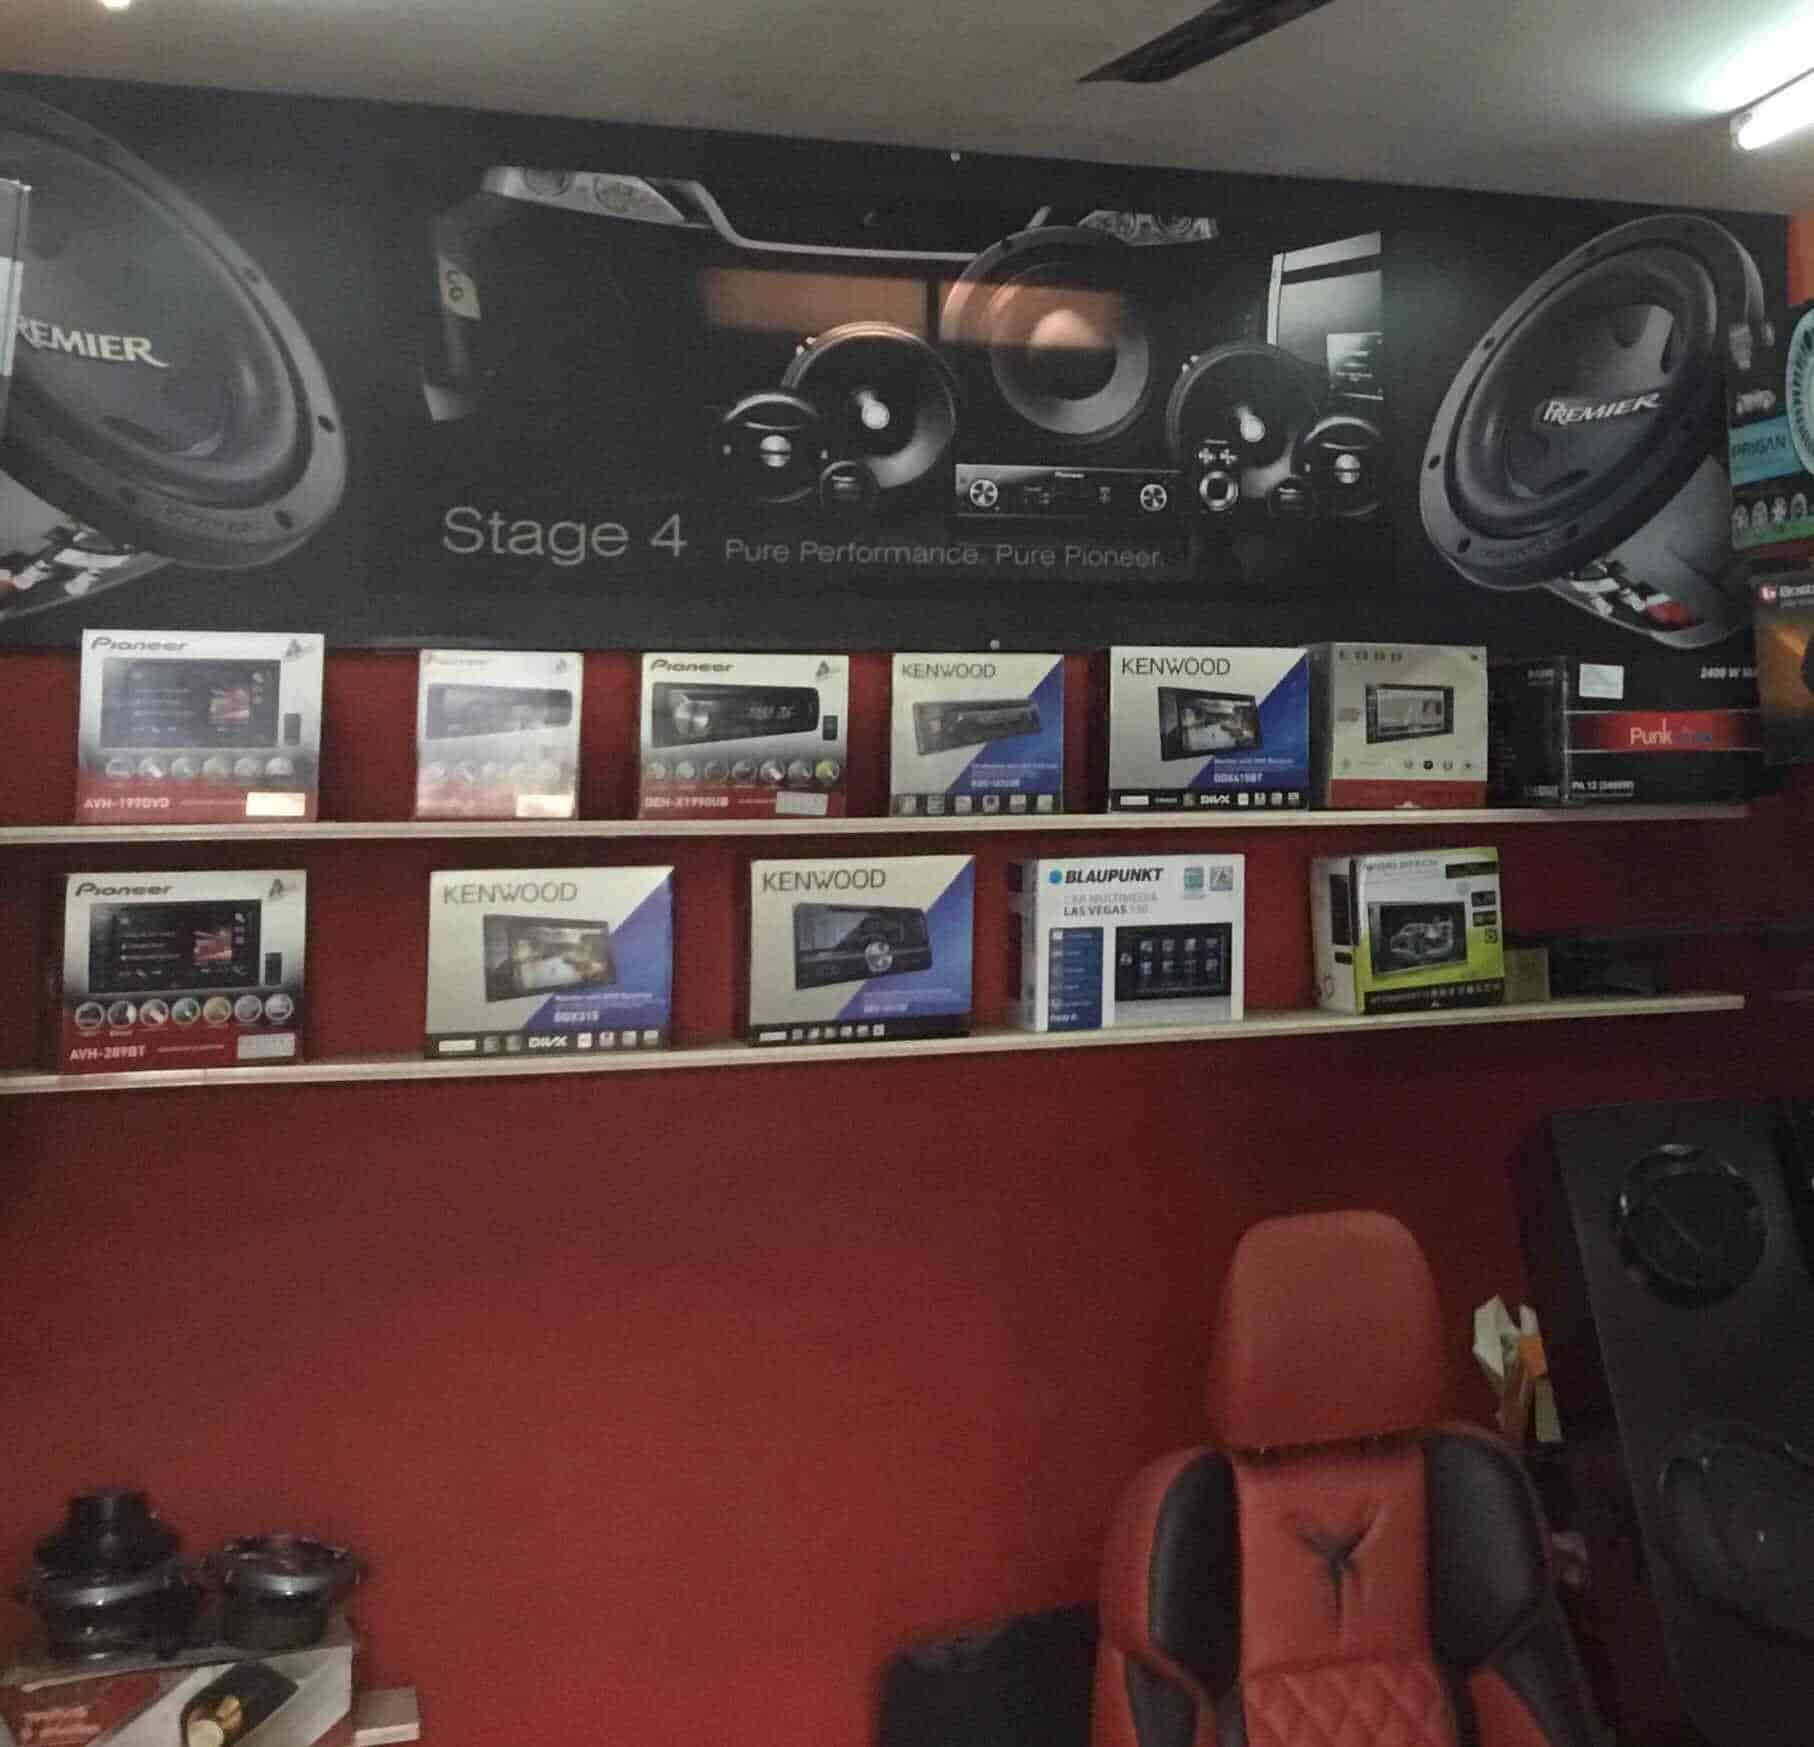 Fashioner Audio Car Eroor Stereo Repair Services In Ernakulam Justdial